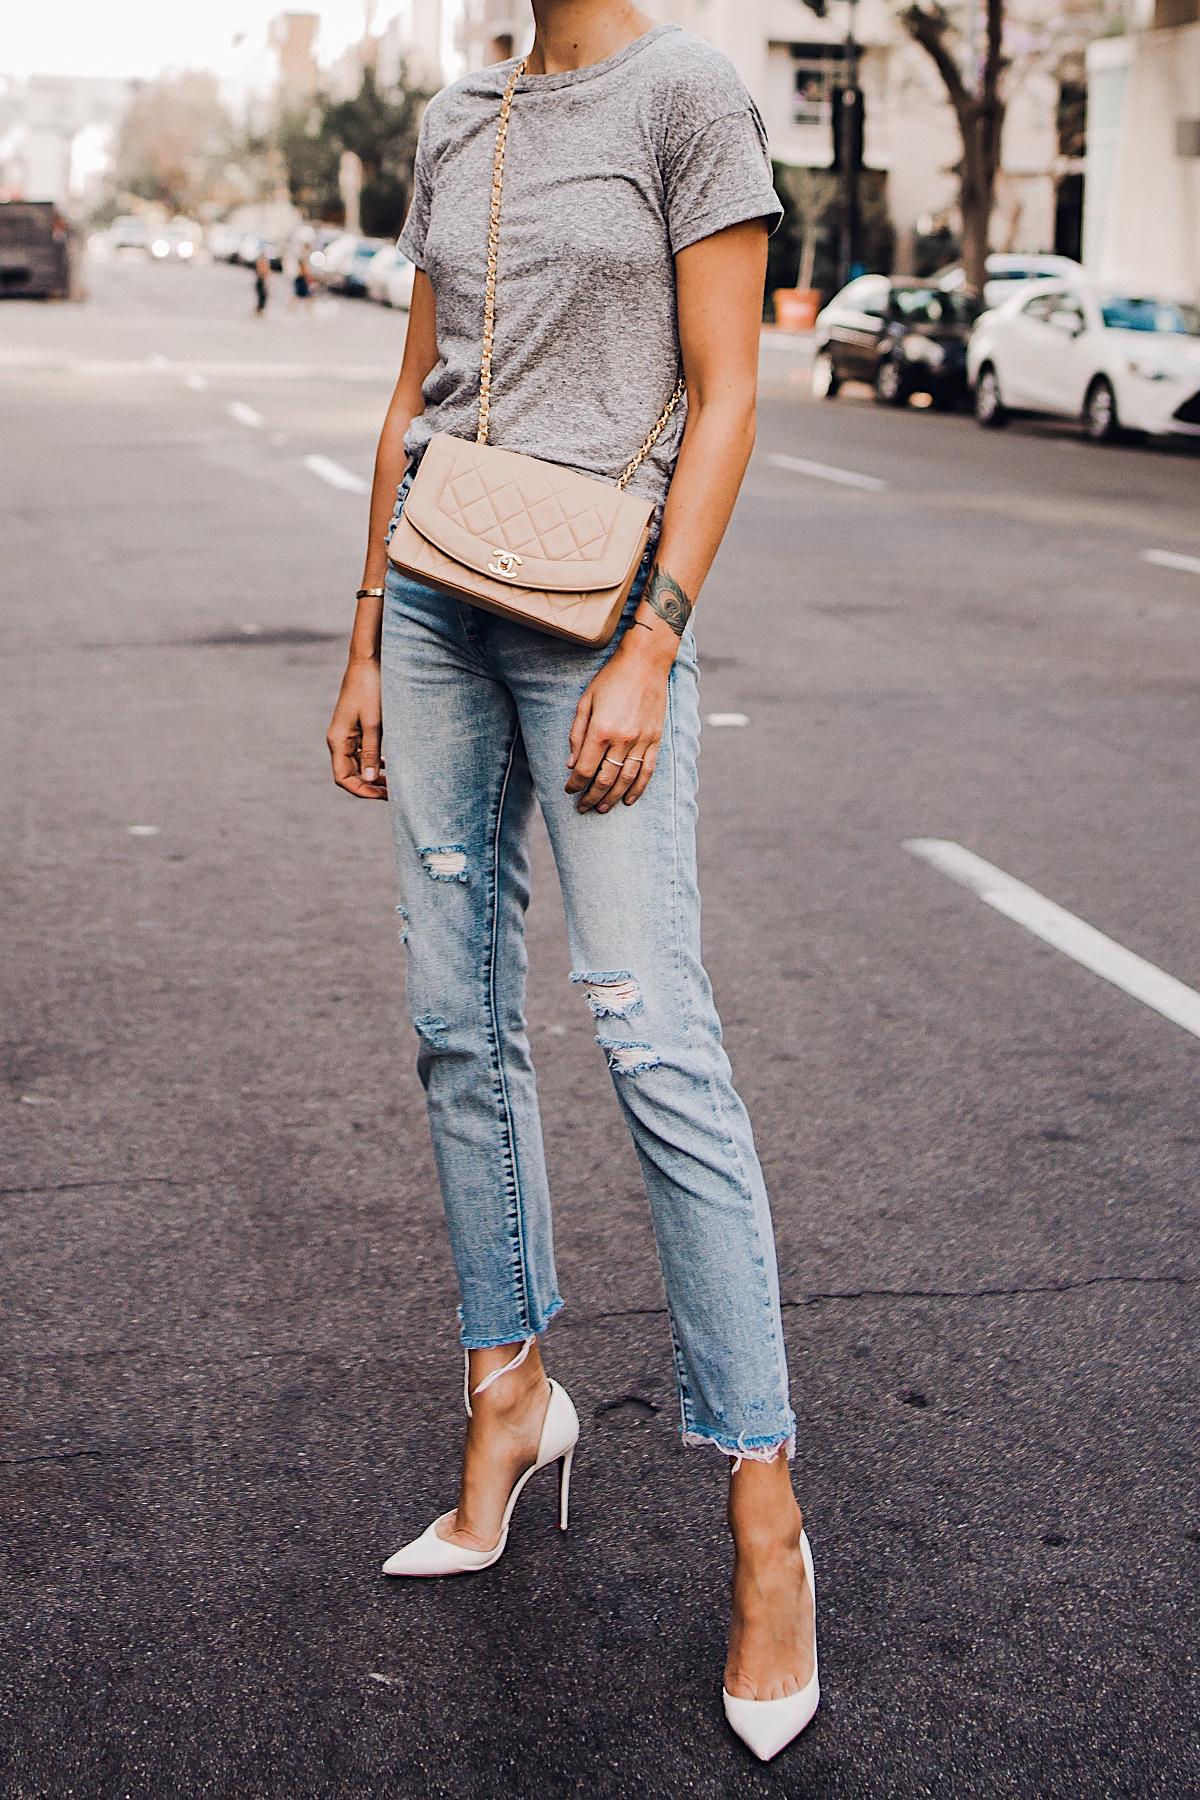 Woman Wearing Topshop Grey Tshirt Blanknyc Ripped Jeans Christian Louboutin White Pumps Chanel Quilted Tan Handbag Fashion Jackson San Diego Blogger Fashion Blogger Street Style